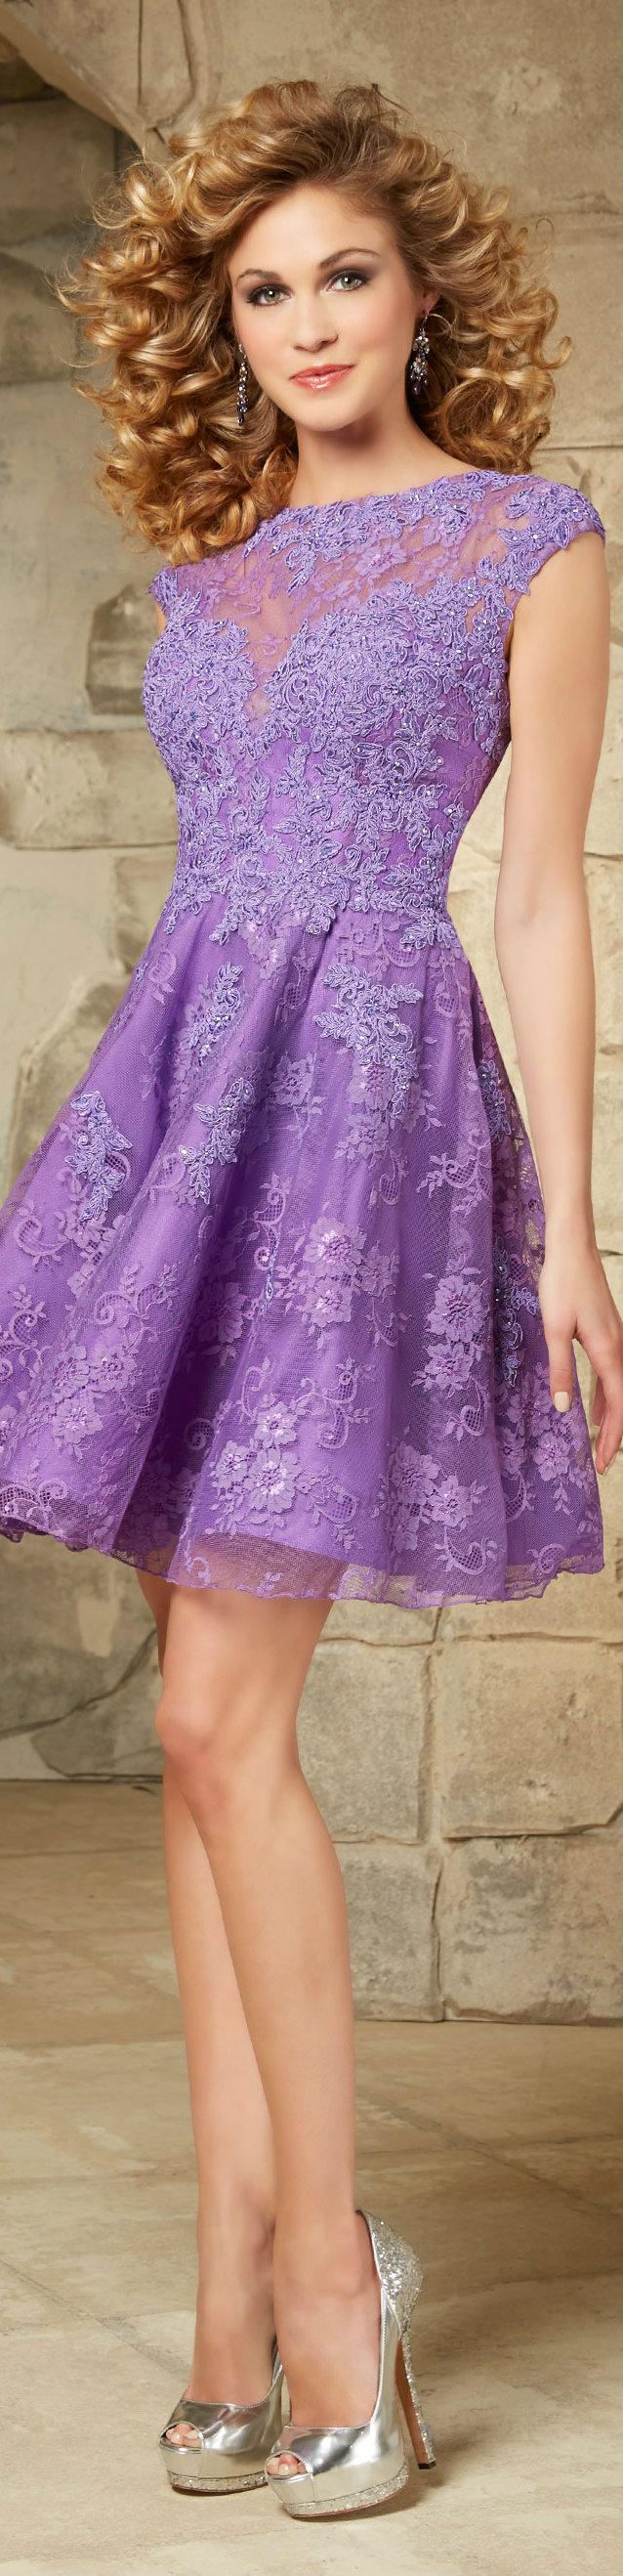 Pin de Linda Dodge en •❈•♕ Fashion - Passionately Purple ...